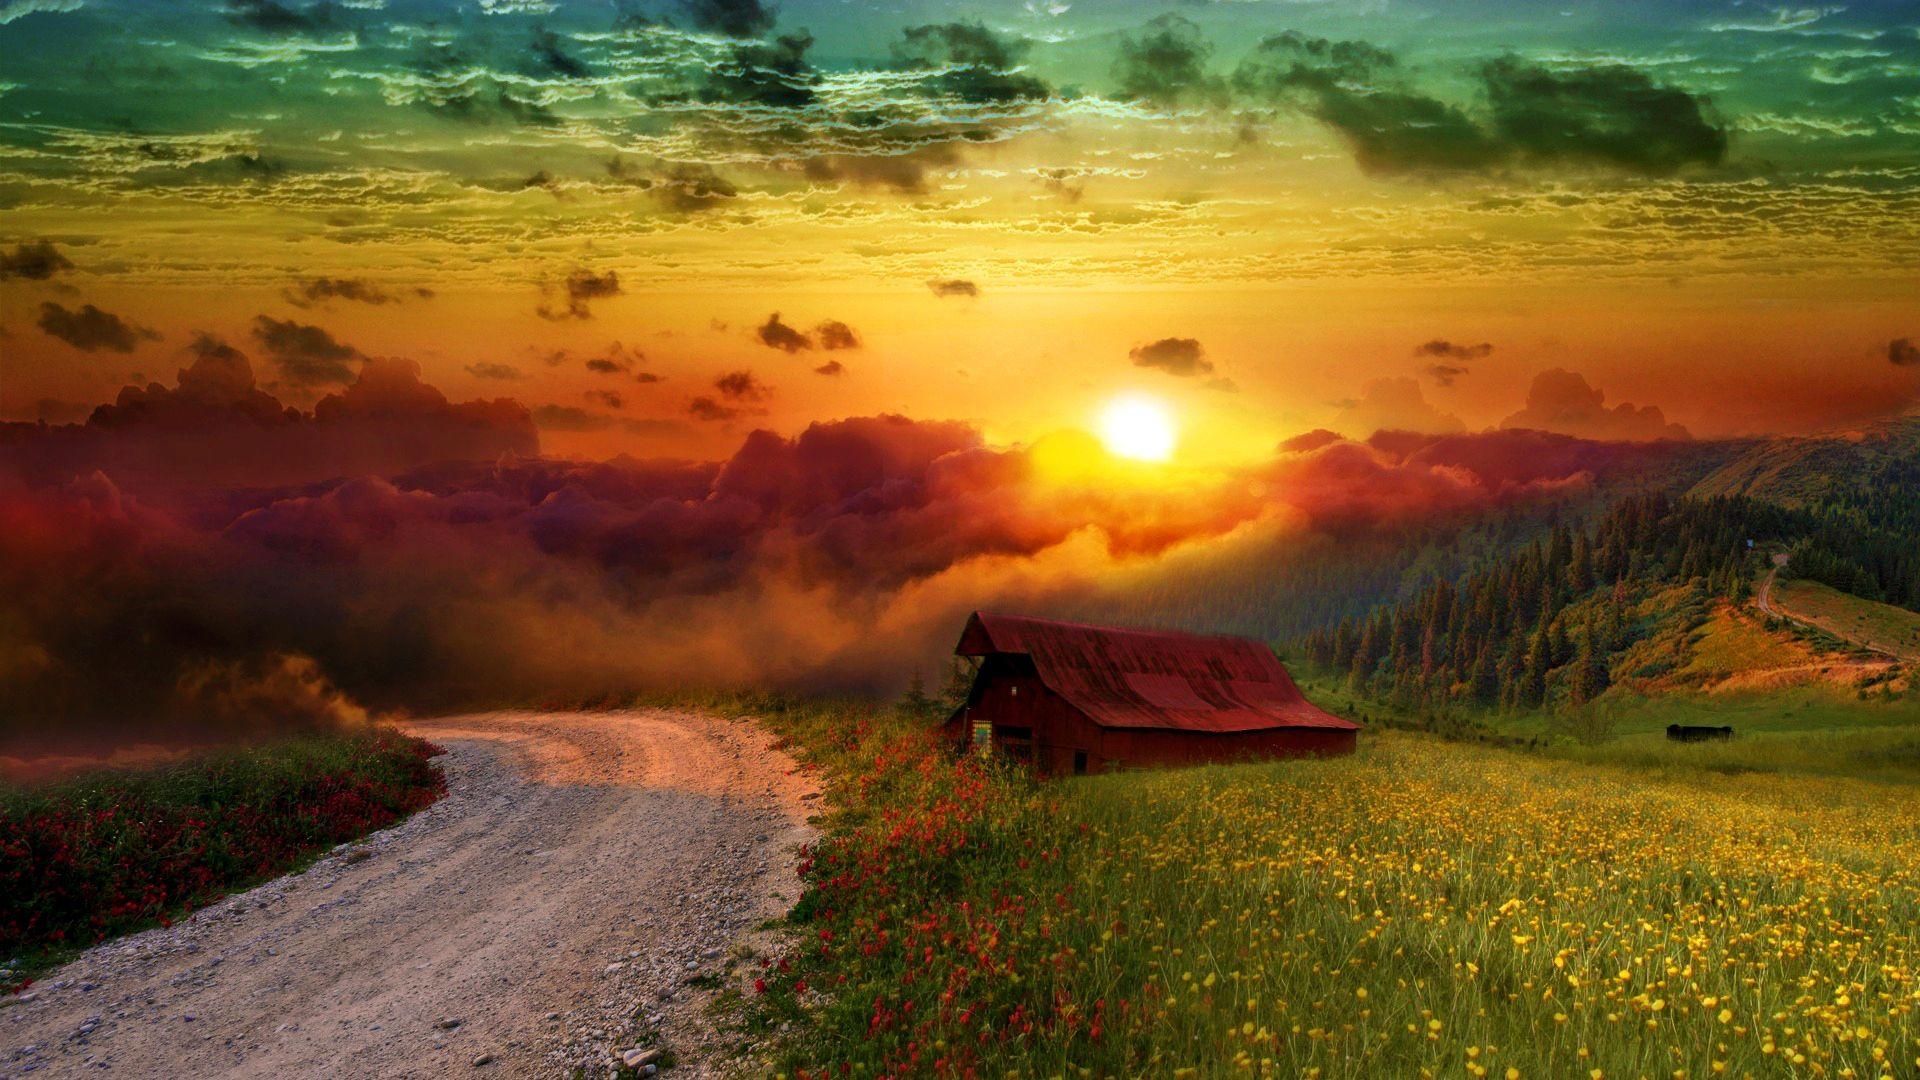 Peaceful Landscape Beautiful Nature Landscape Wallpaper